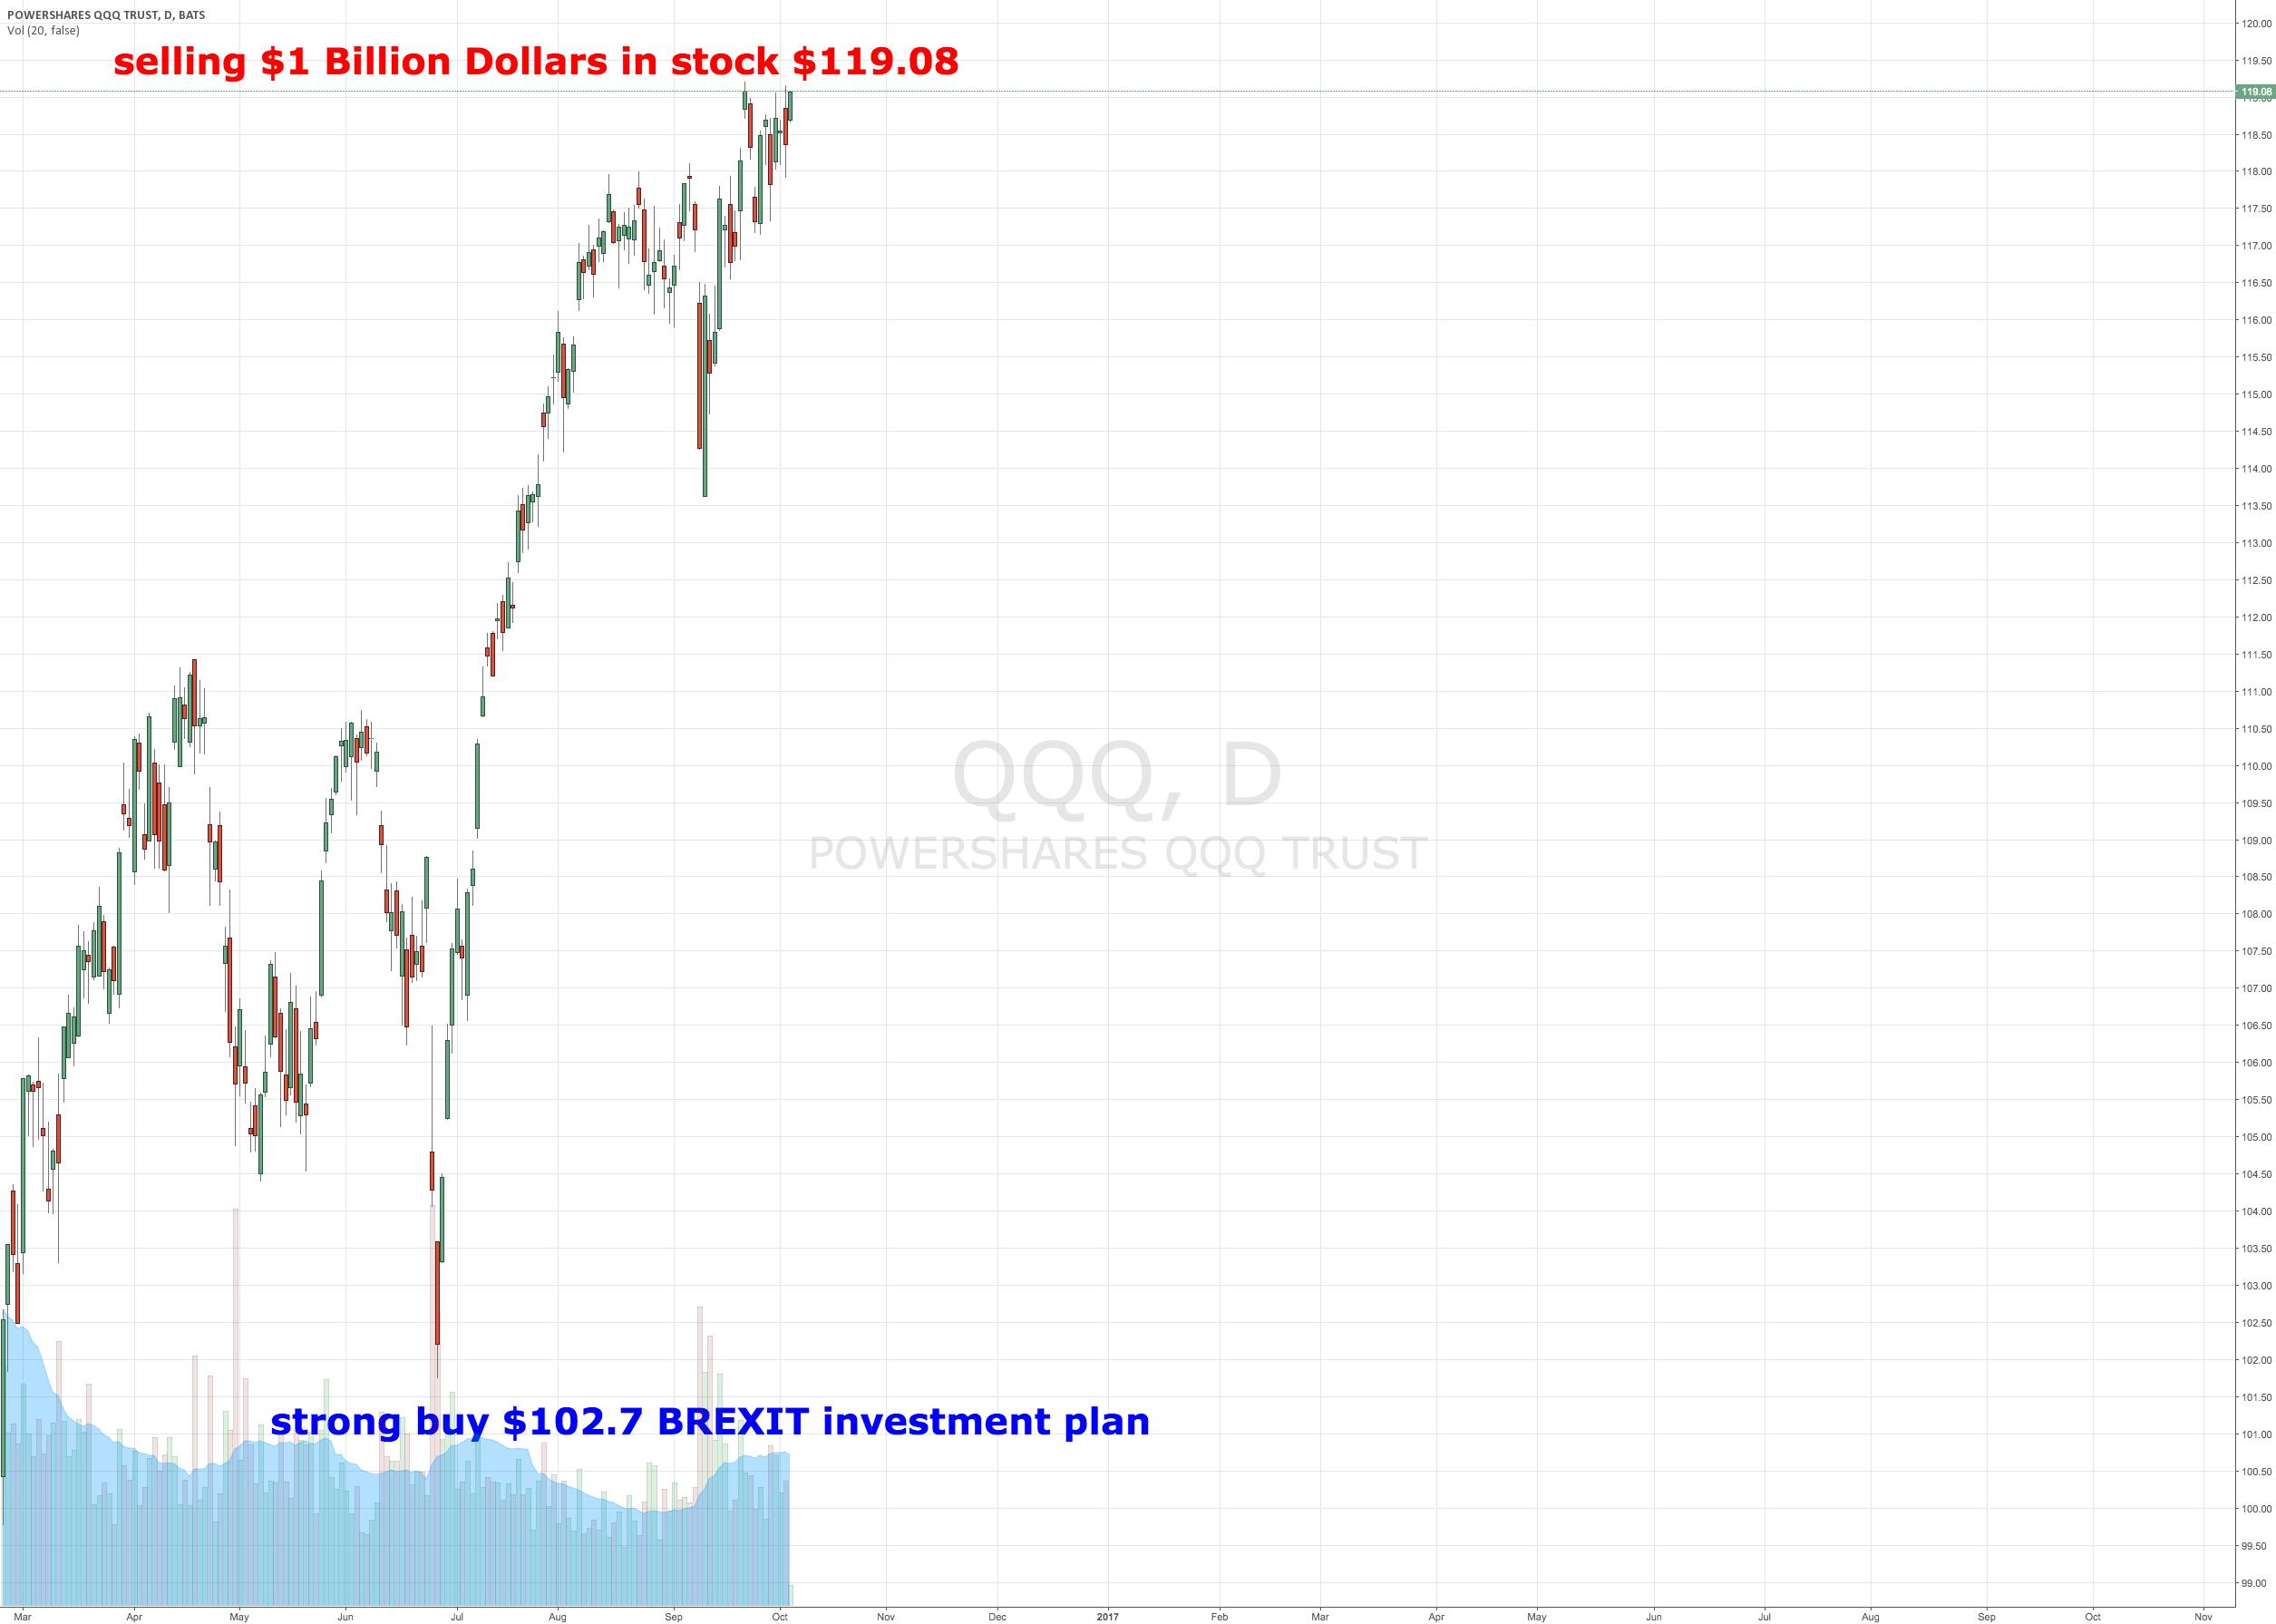 Selling Live $1 Billion Dollars in Stock